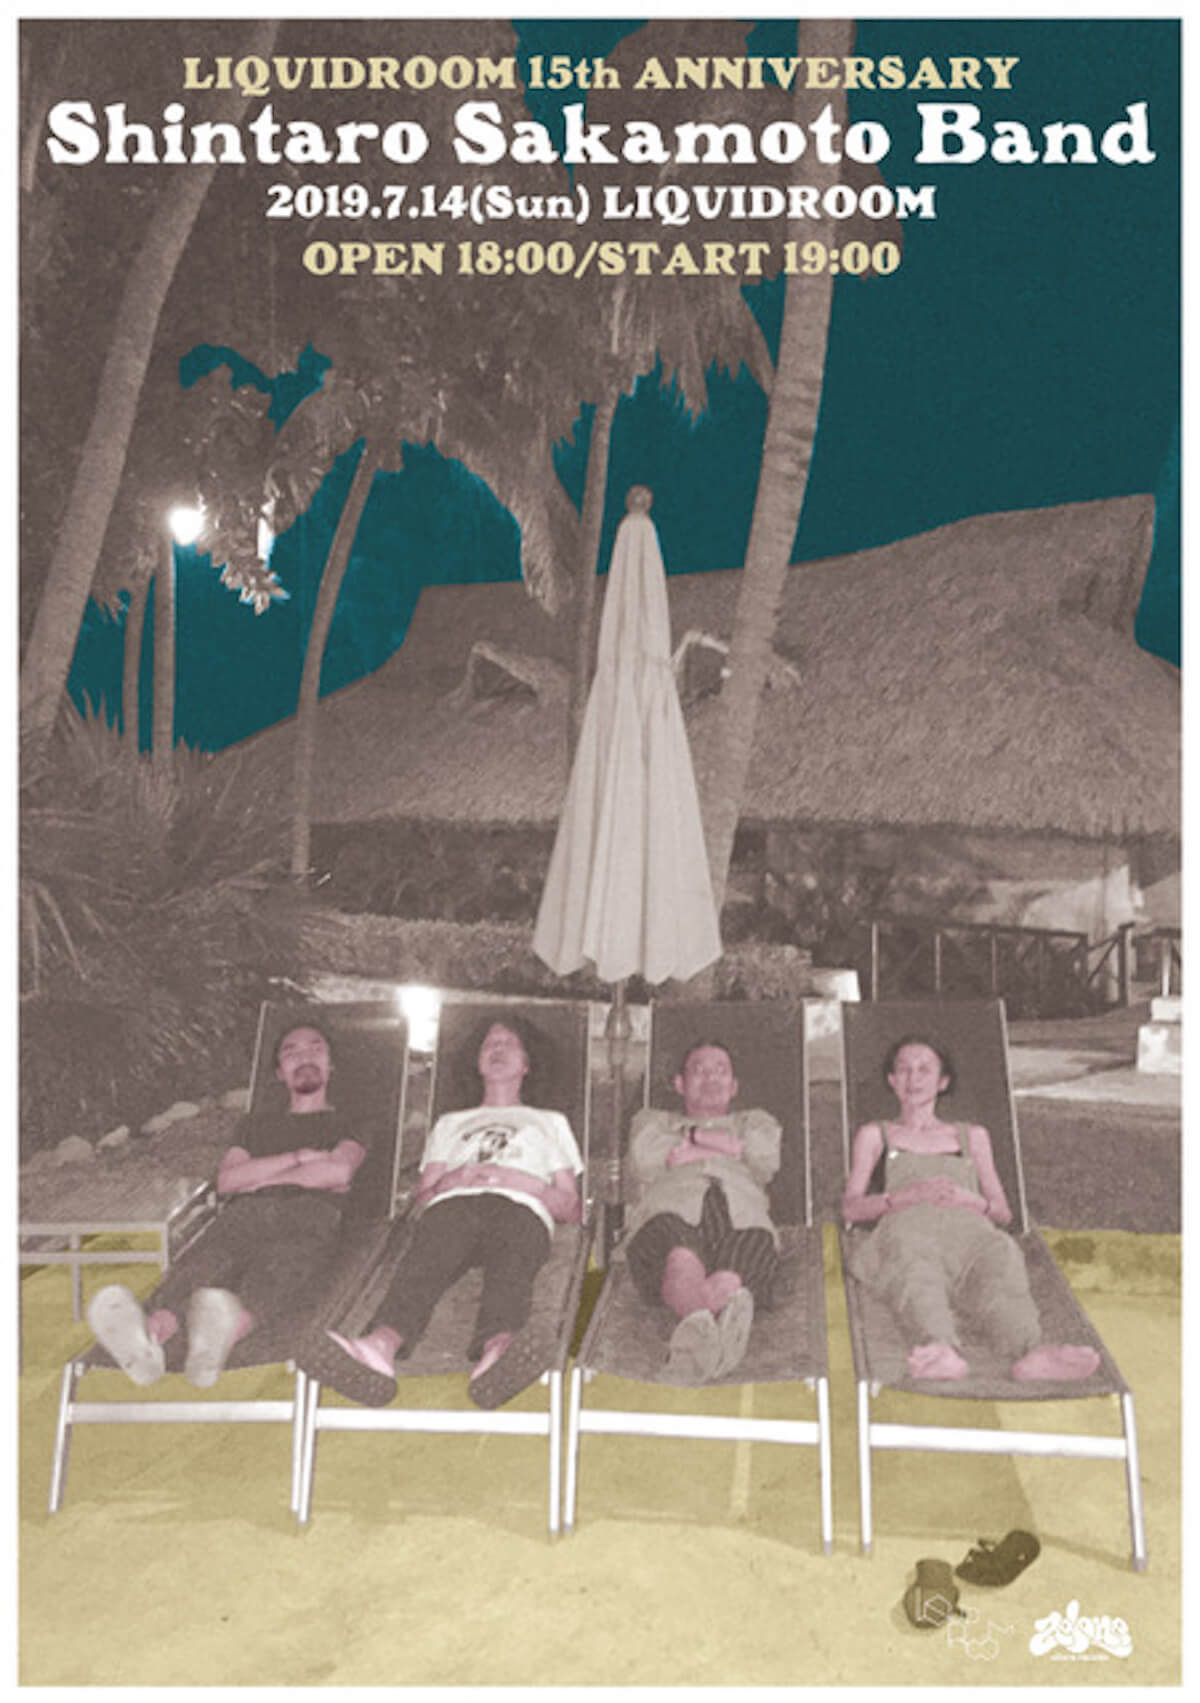 LIQUIDROOM15周年公演に坂本慎太郎、envy/GEZAN、monoが登場 music190514-liquidroom15th-1